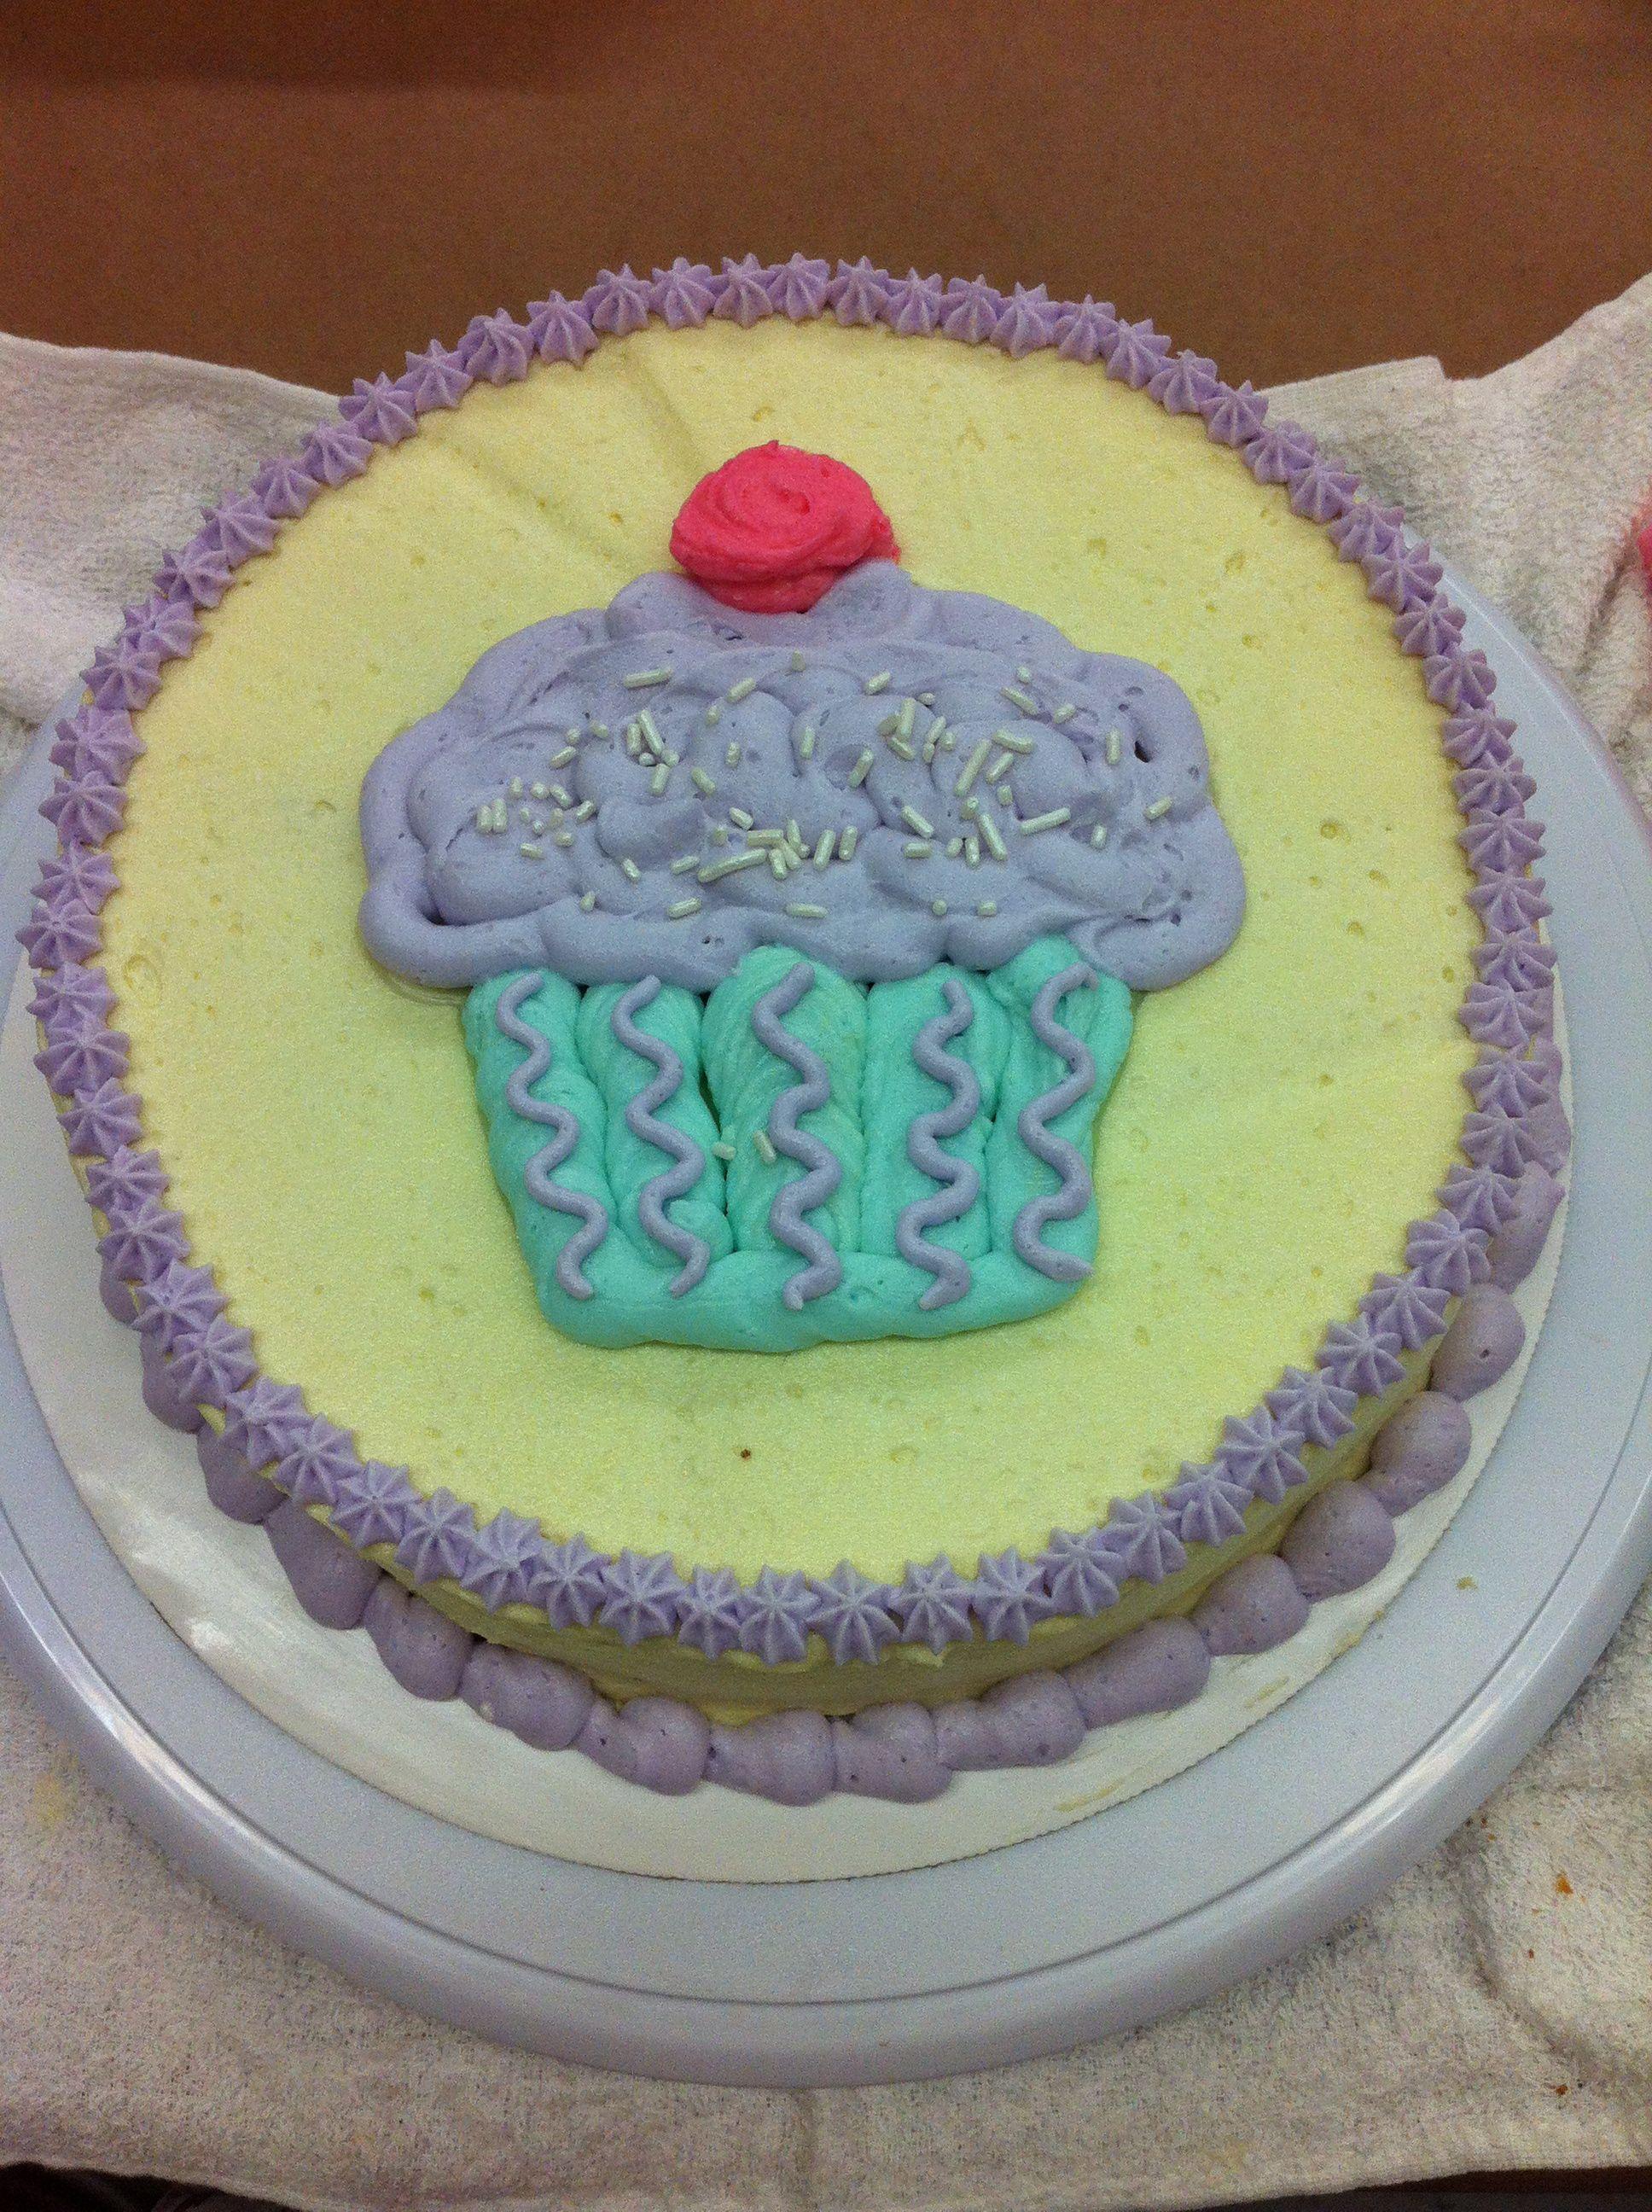 Wilton Cake Decorating Cake Ideas and Designs